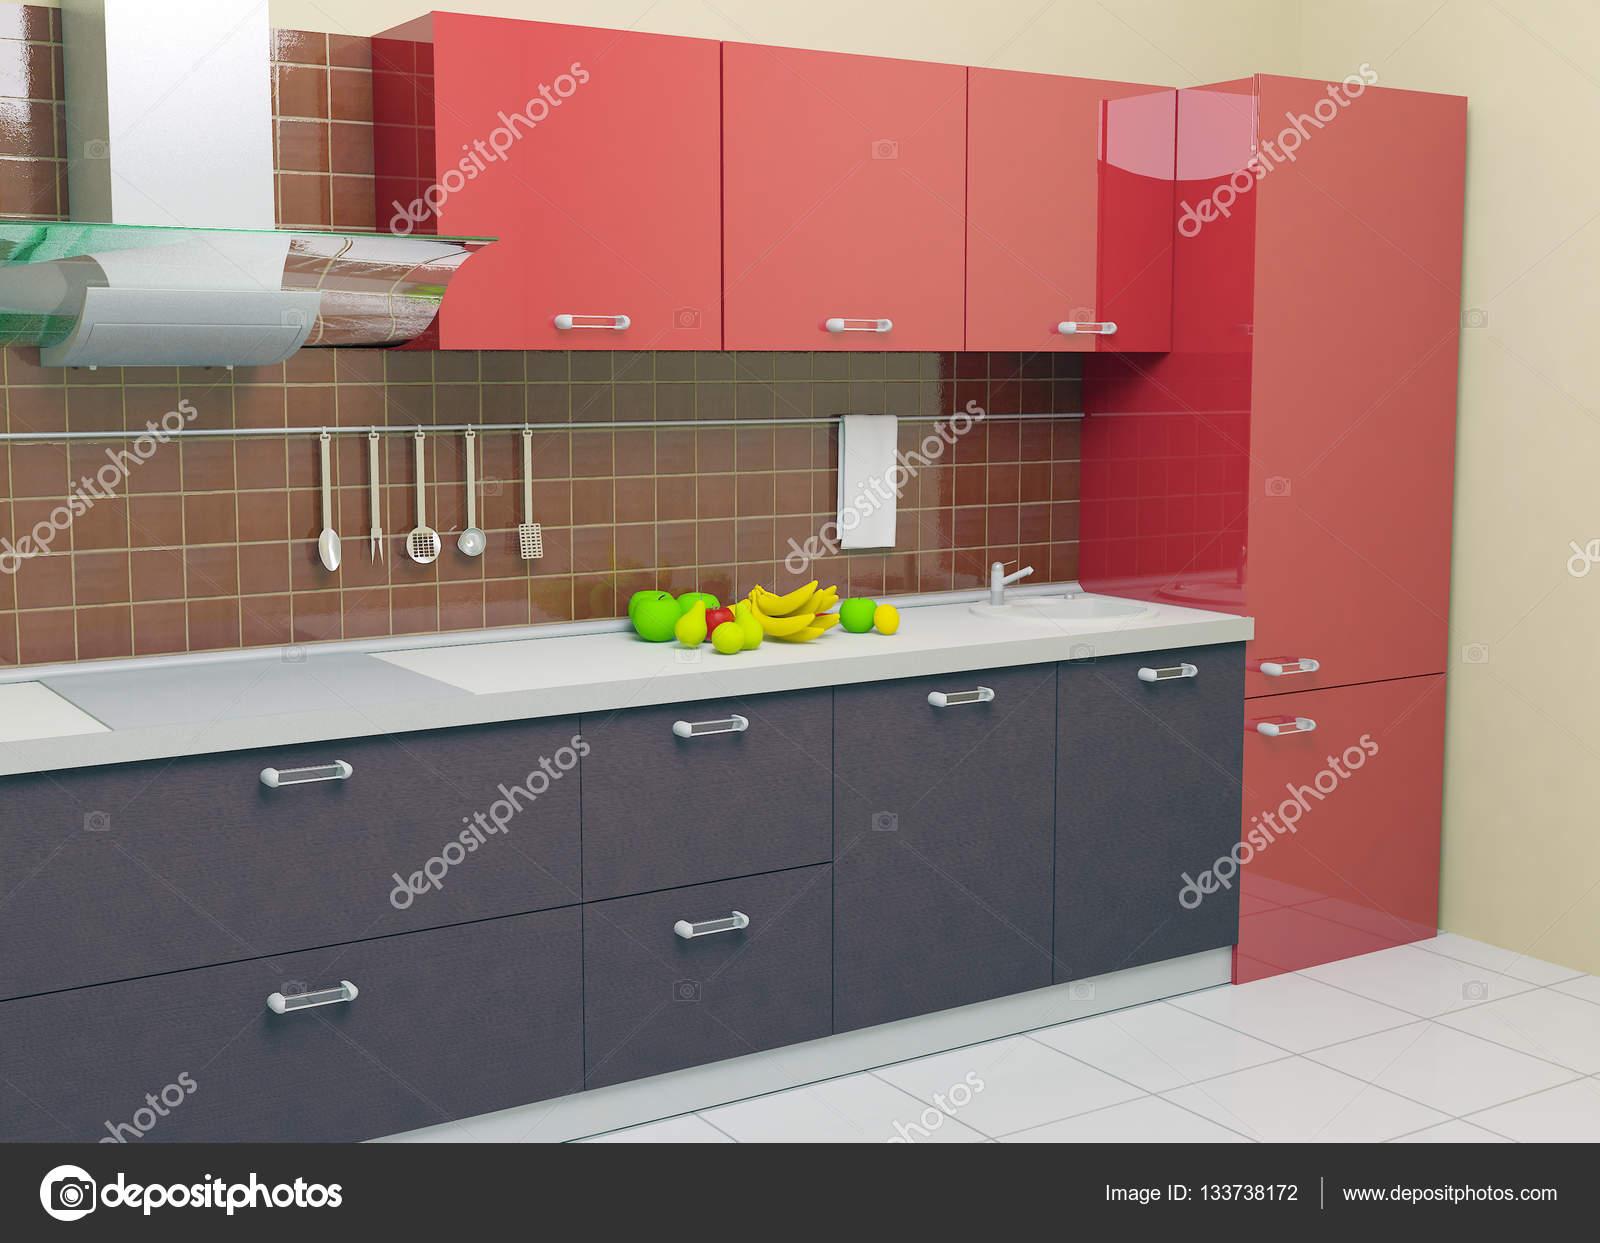 cucina moderna rossa — Foto Stock © Polli735 #133738172